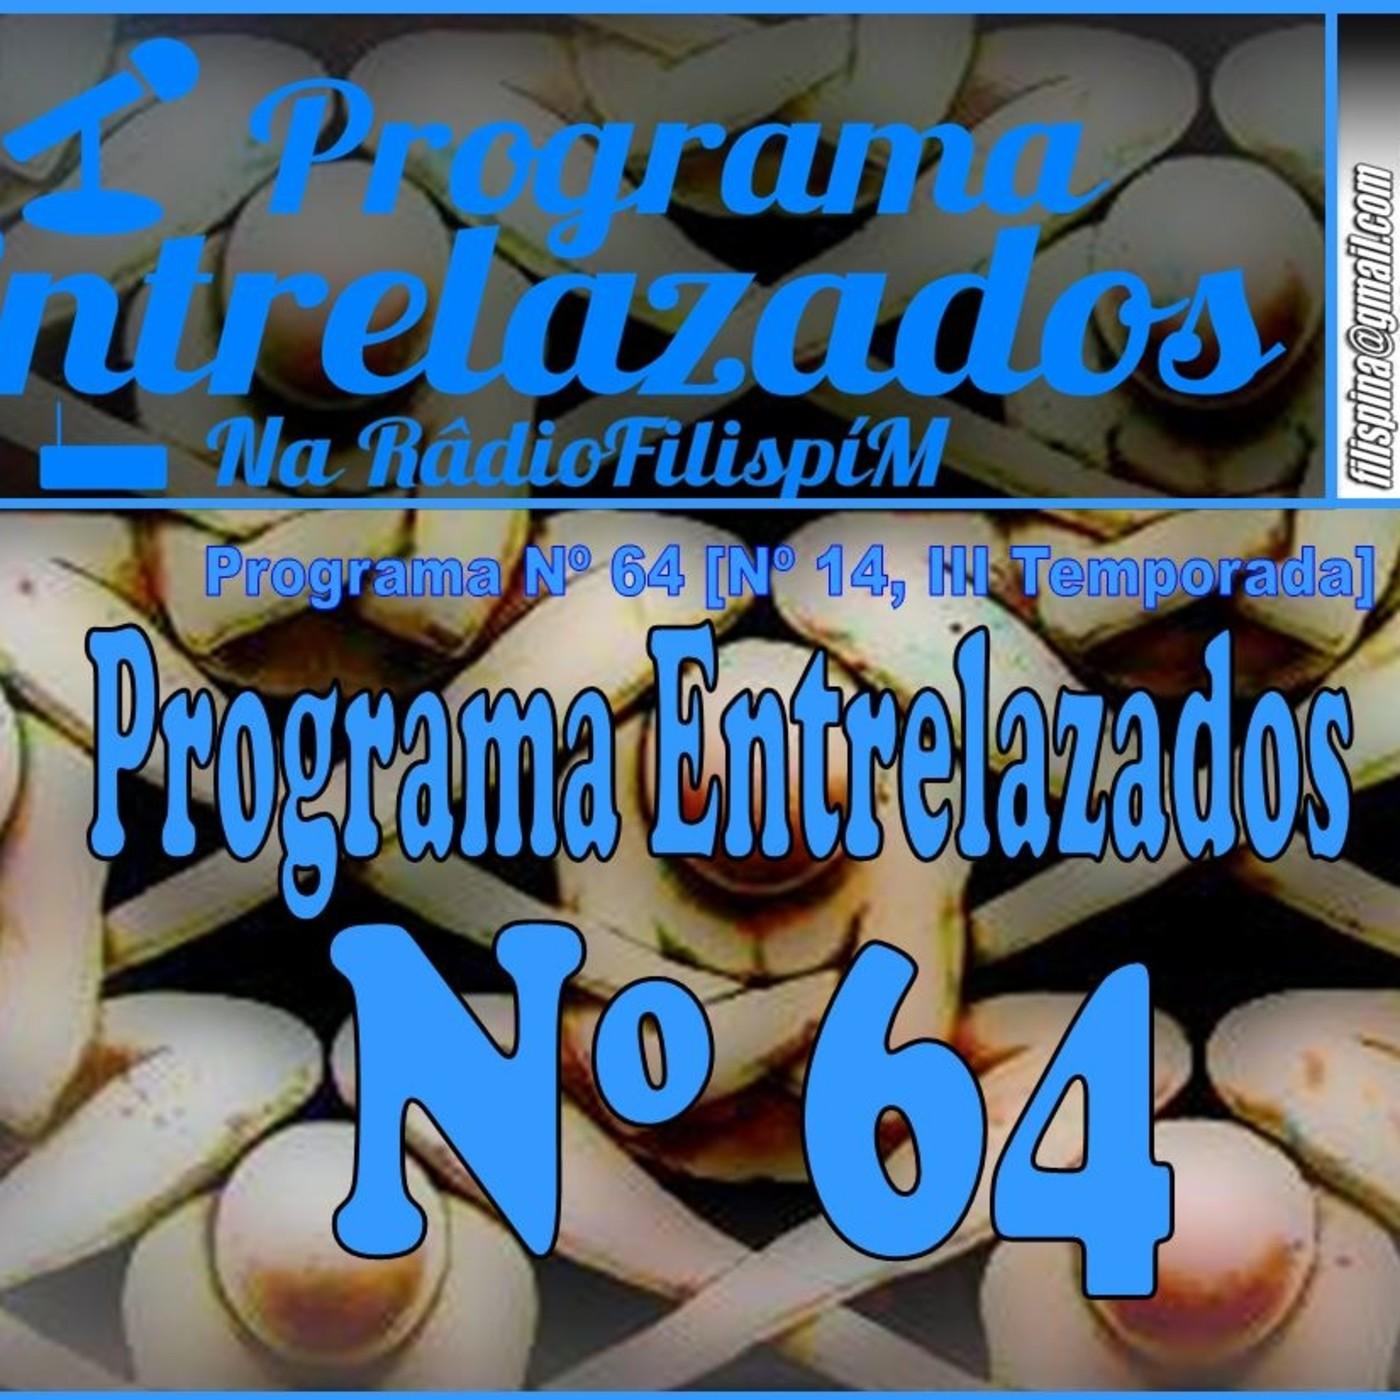 64º Programa Entrelazados [14º – 3T]